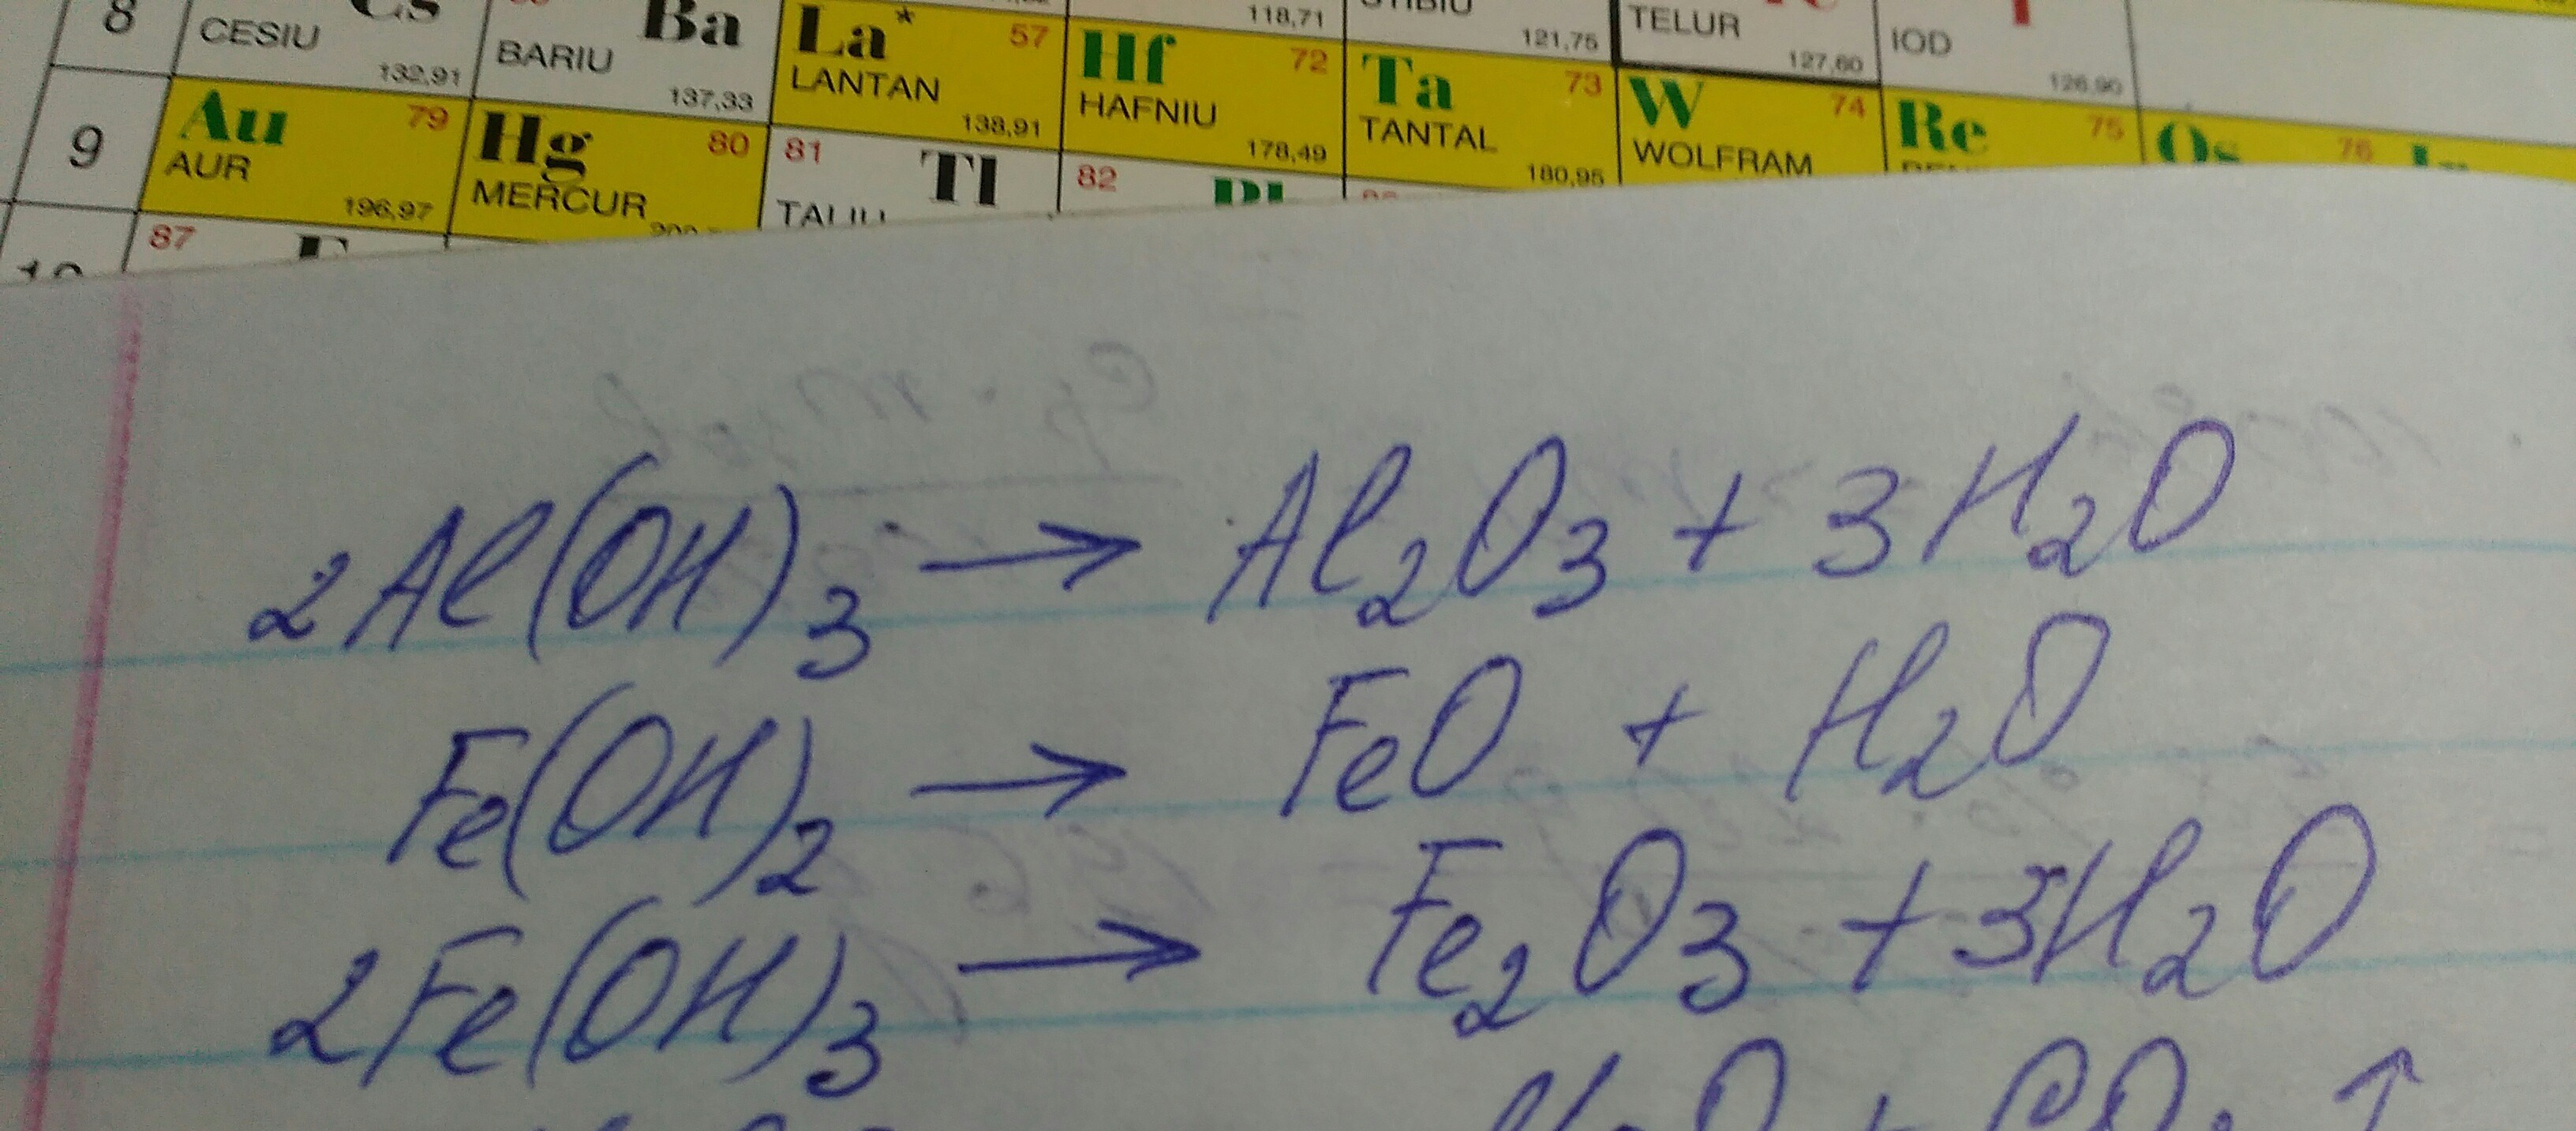 descompunerea termica A BAZELOR Fe(OH)3-Fe2O3+H2O - Brainly.ro